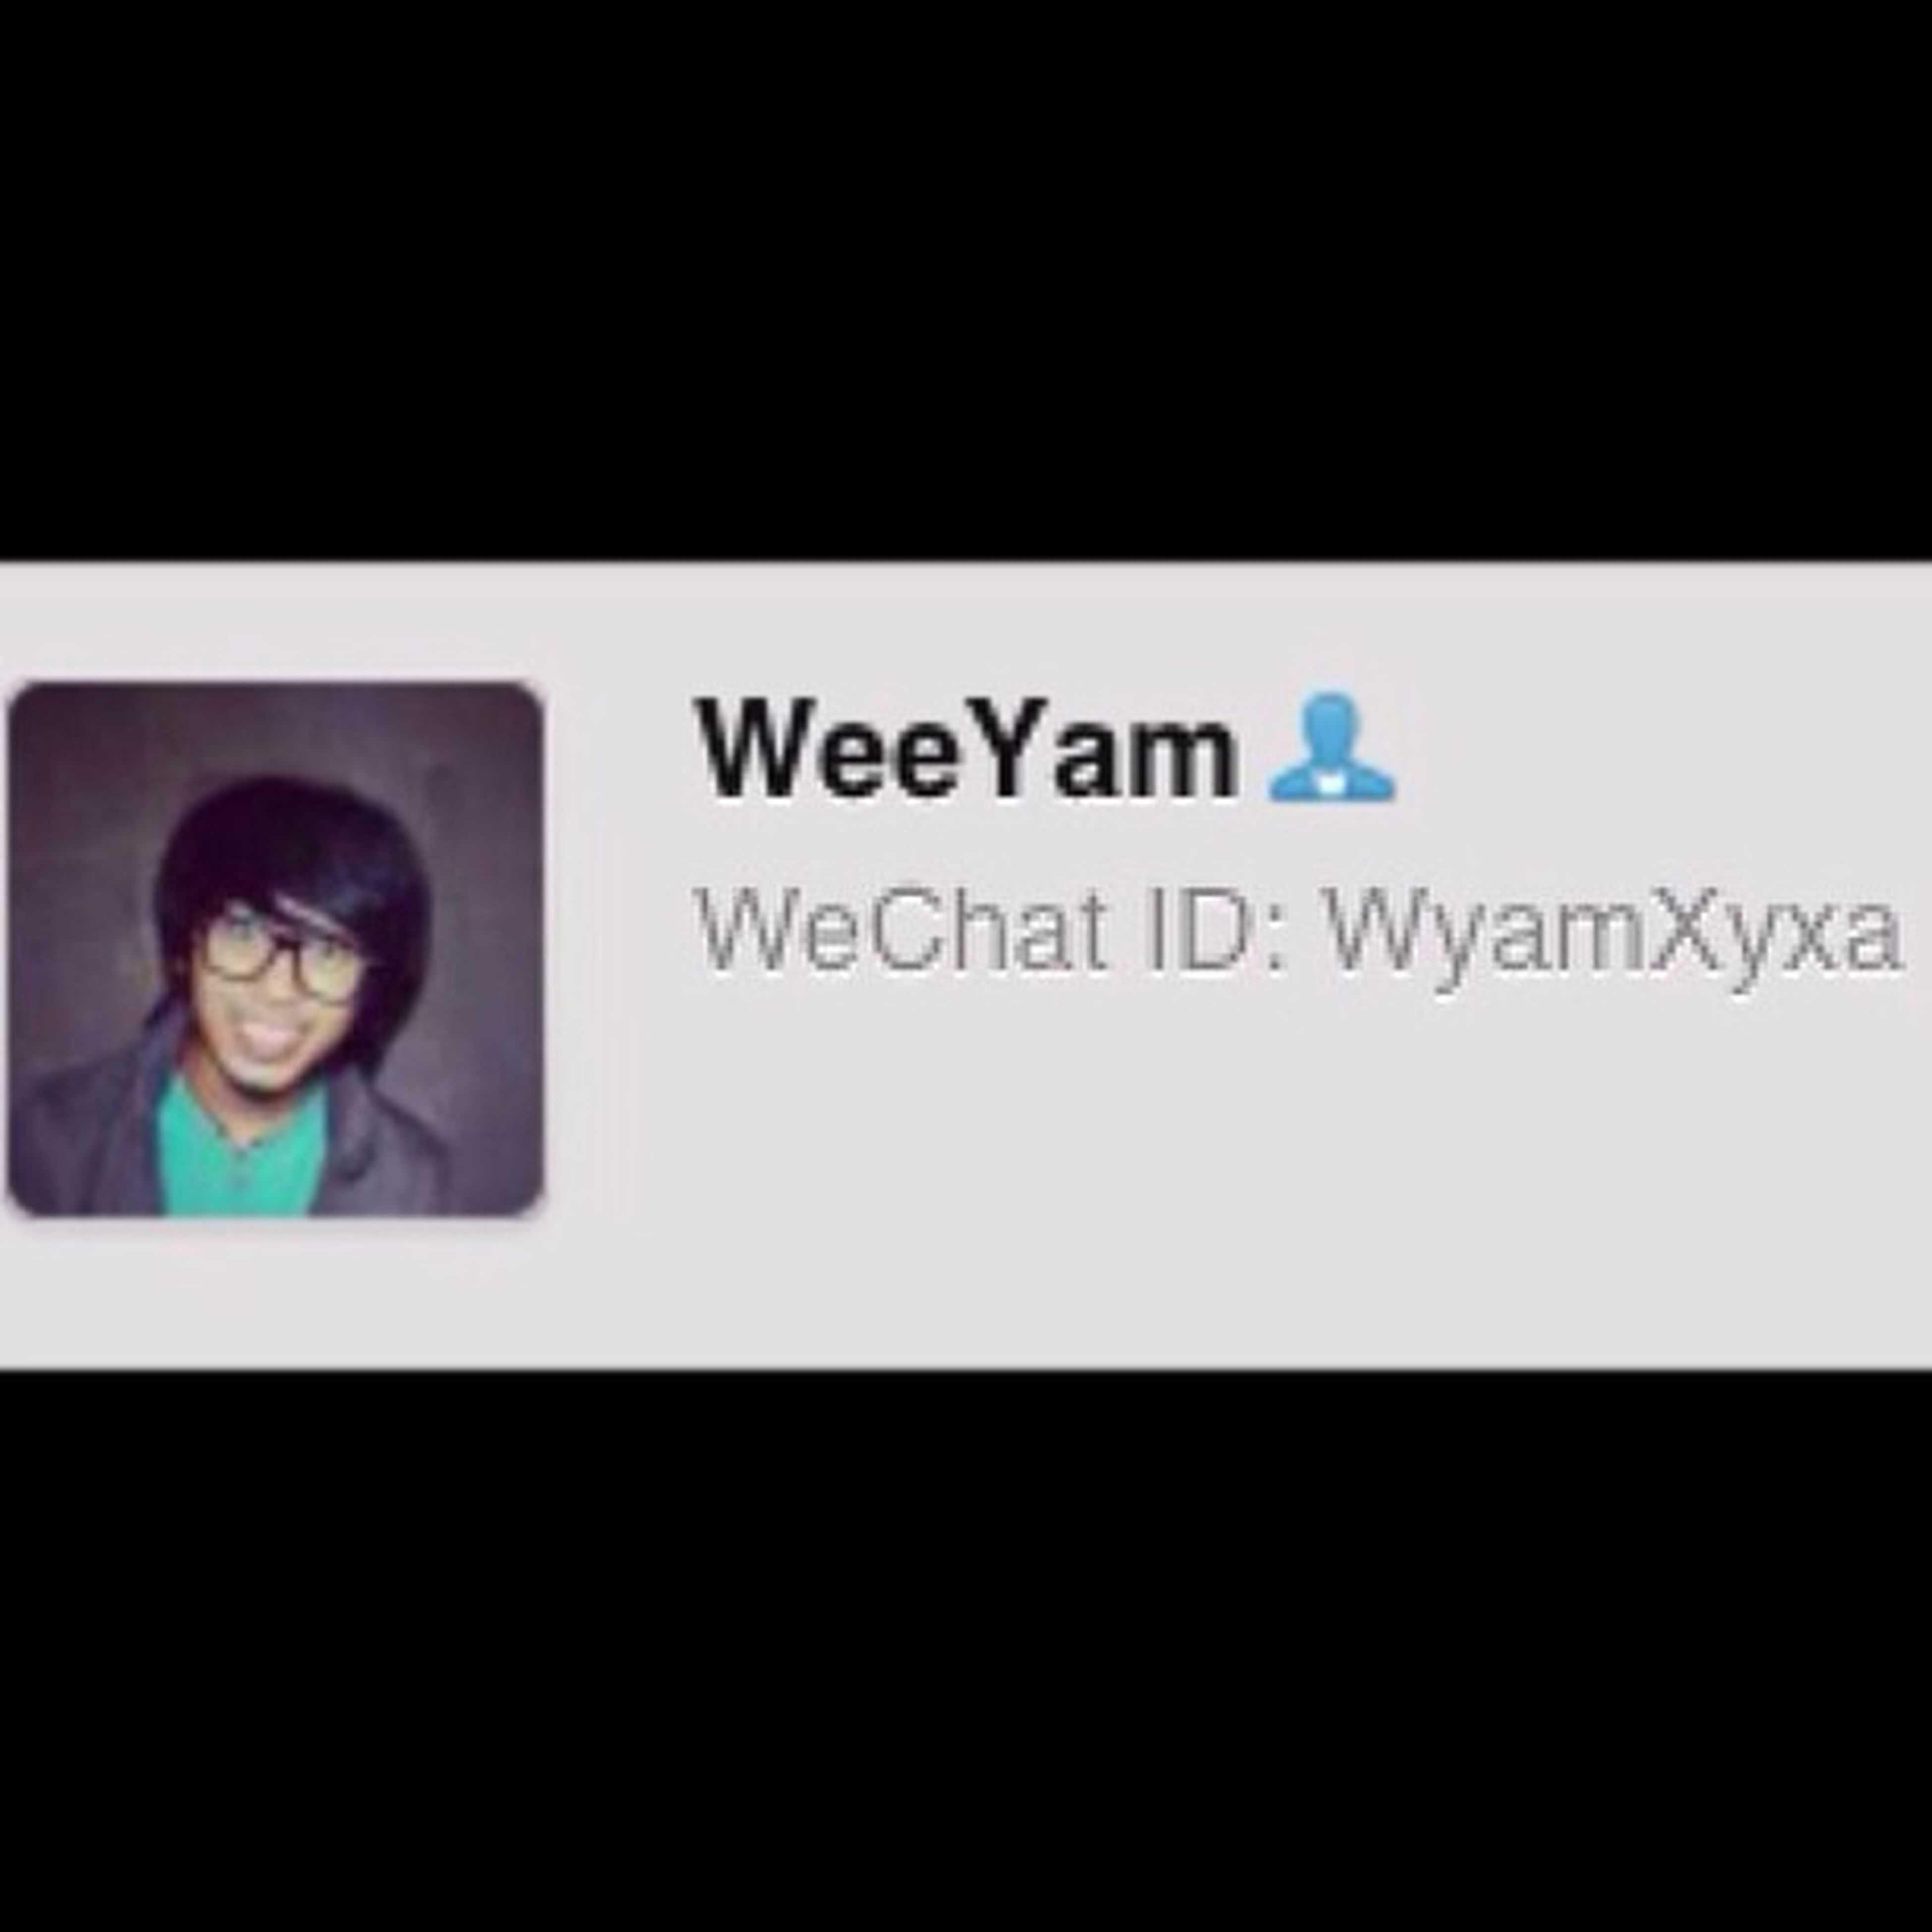 Follow him on Wechat Follow my BeshPal I'm begging you! Hahaha